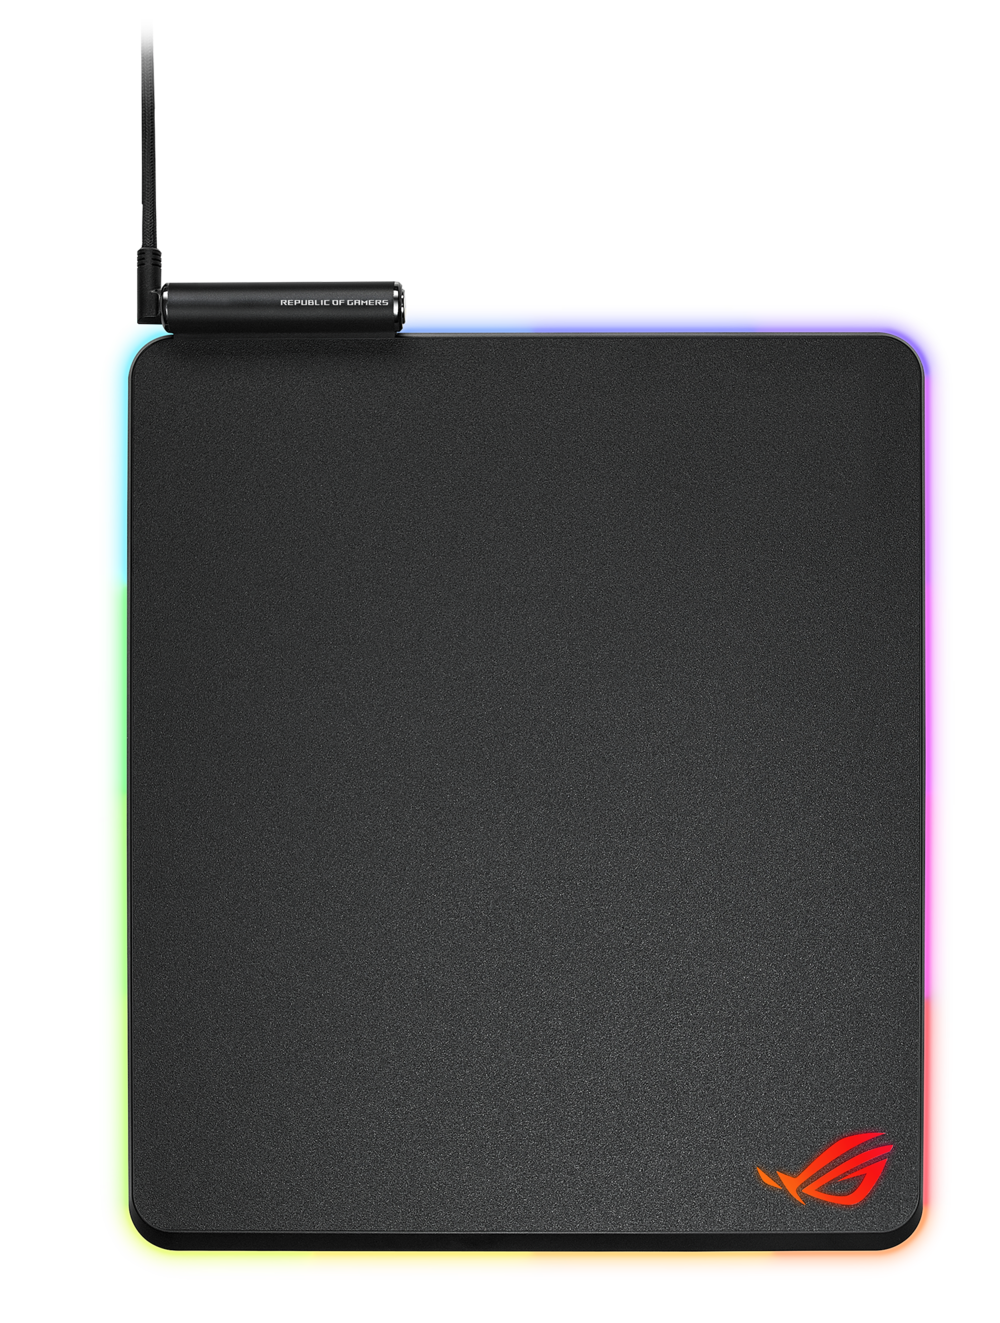 ASUS ROG Balteus RGB Gaming-Mauspad